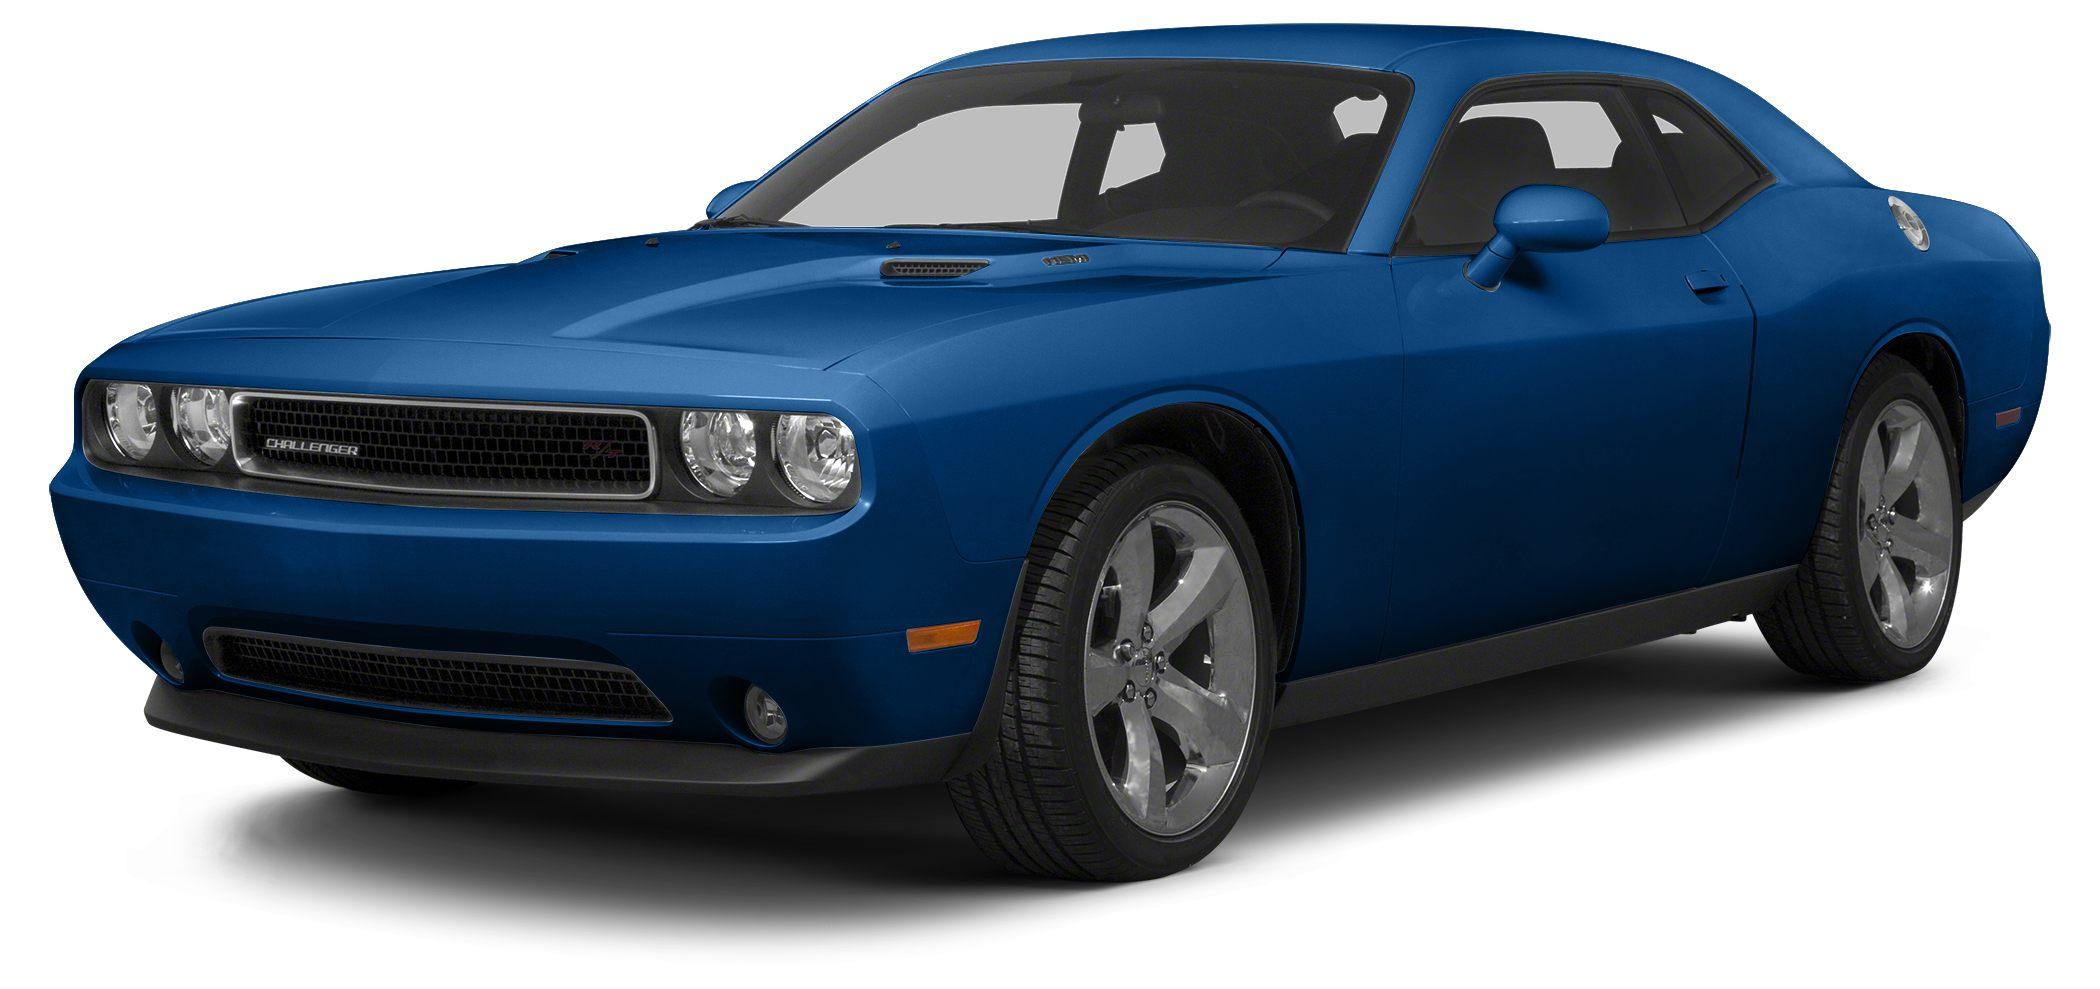 2012 Dodge Challenger RT RT HEMI EDITIONRARE BLUE METALLIC1 OWNERCARFAX CERTIFIEDIMMAC